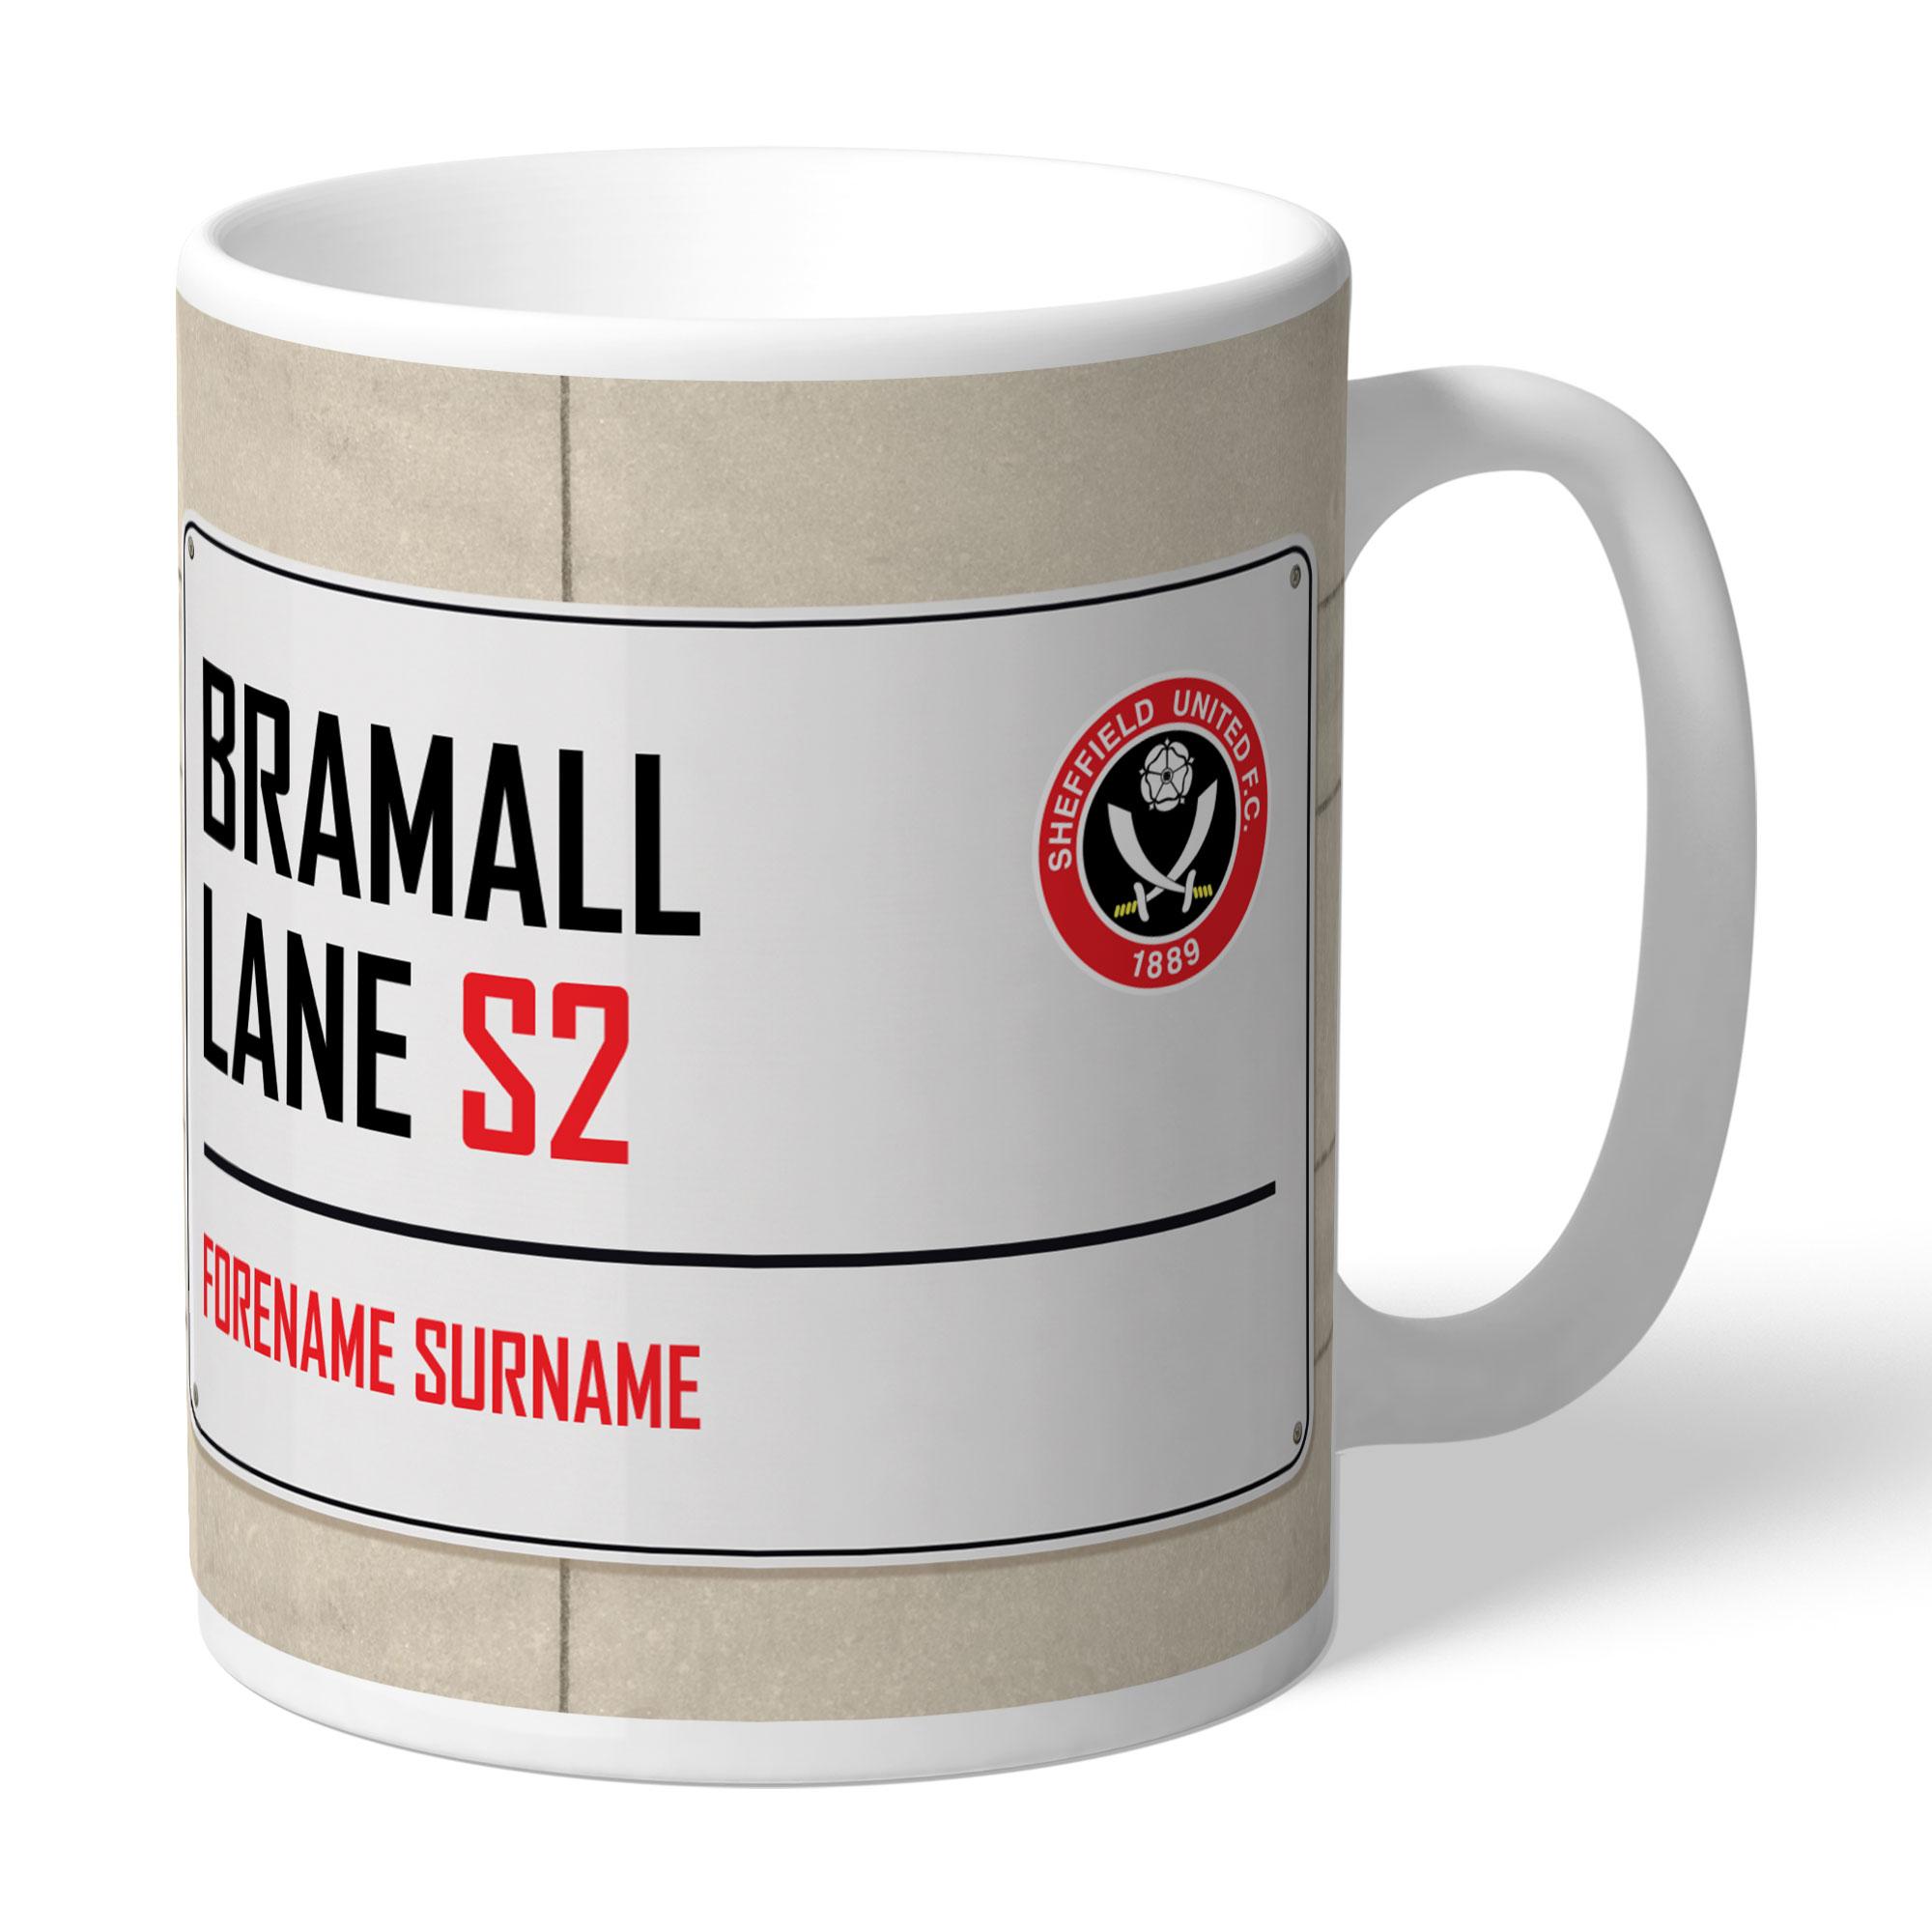 Sheffield United FC Street Sign Mug